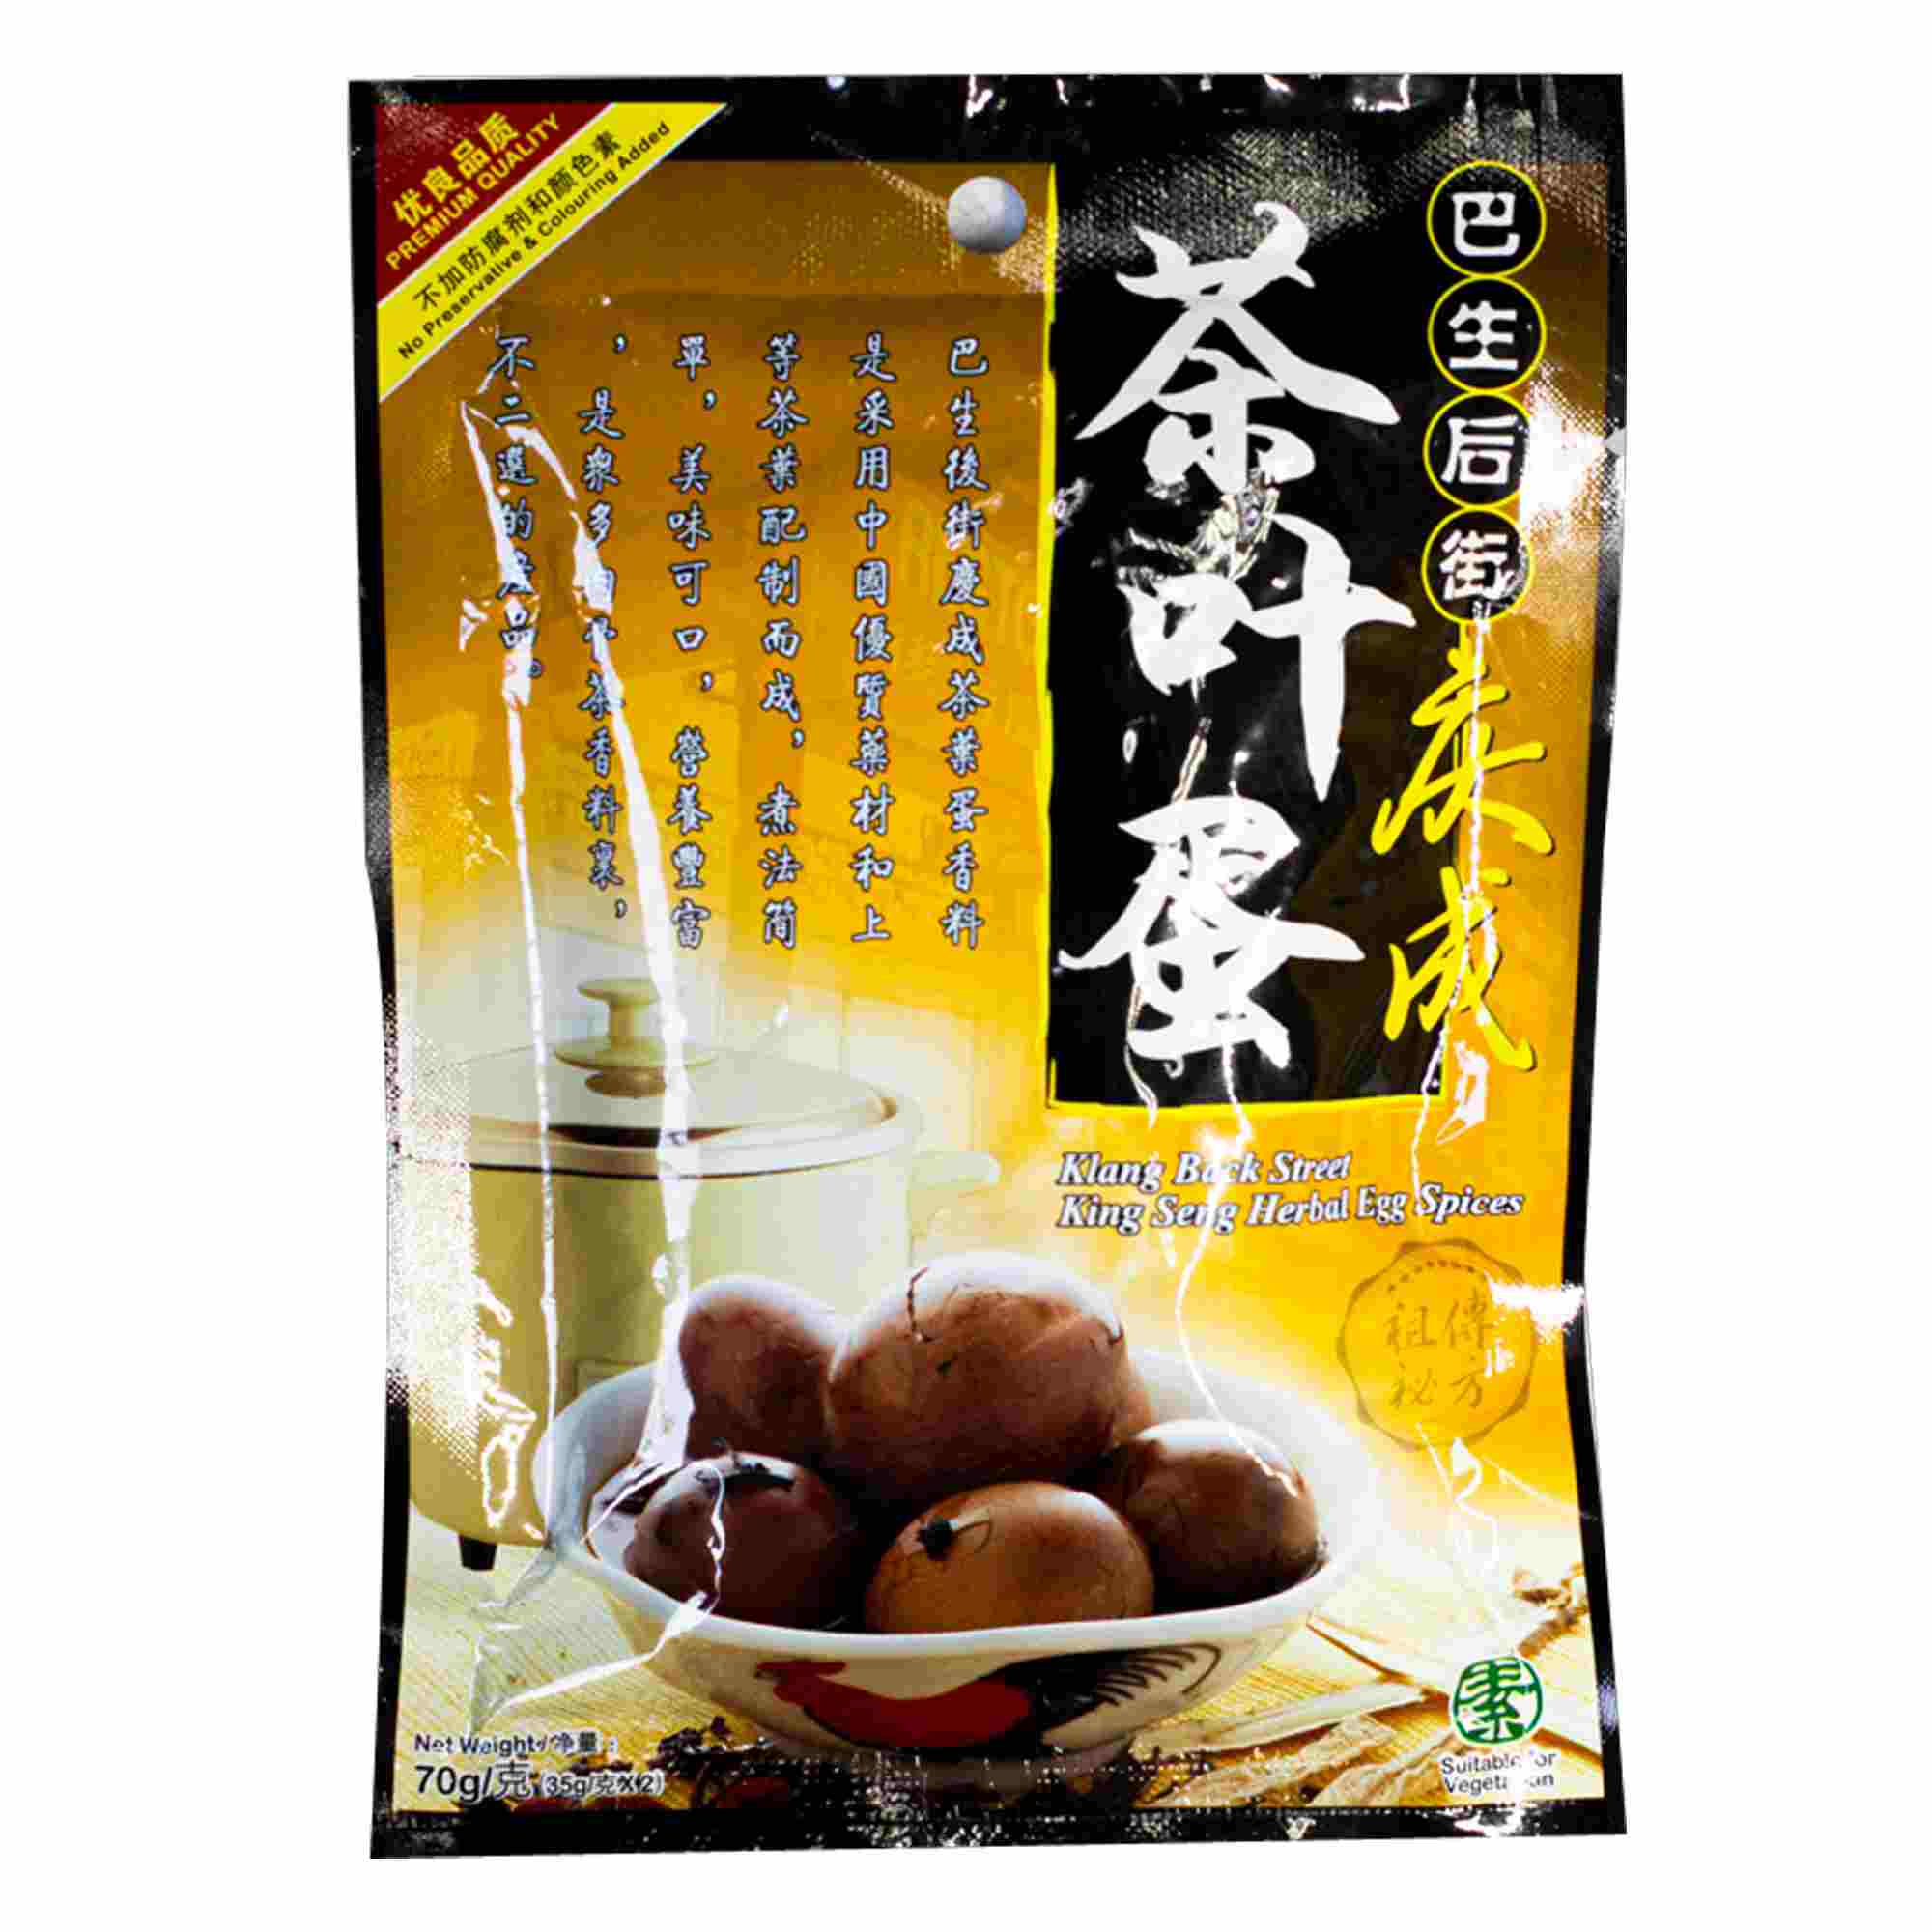 Image King Seng Herbal Egg 庆成 - 茶叶蛋 35grams